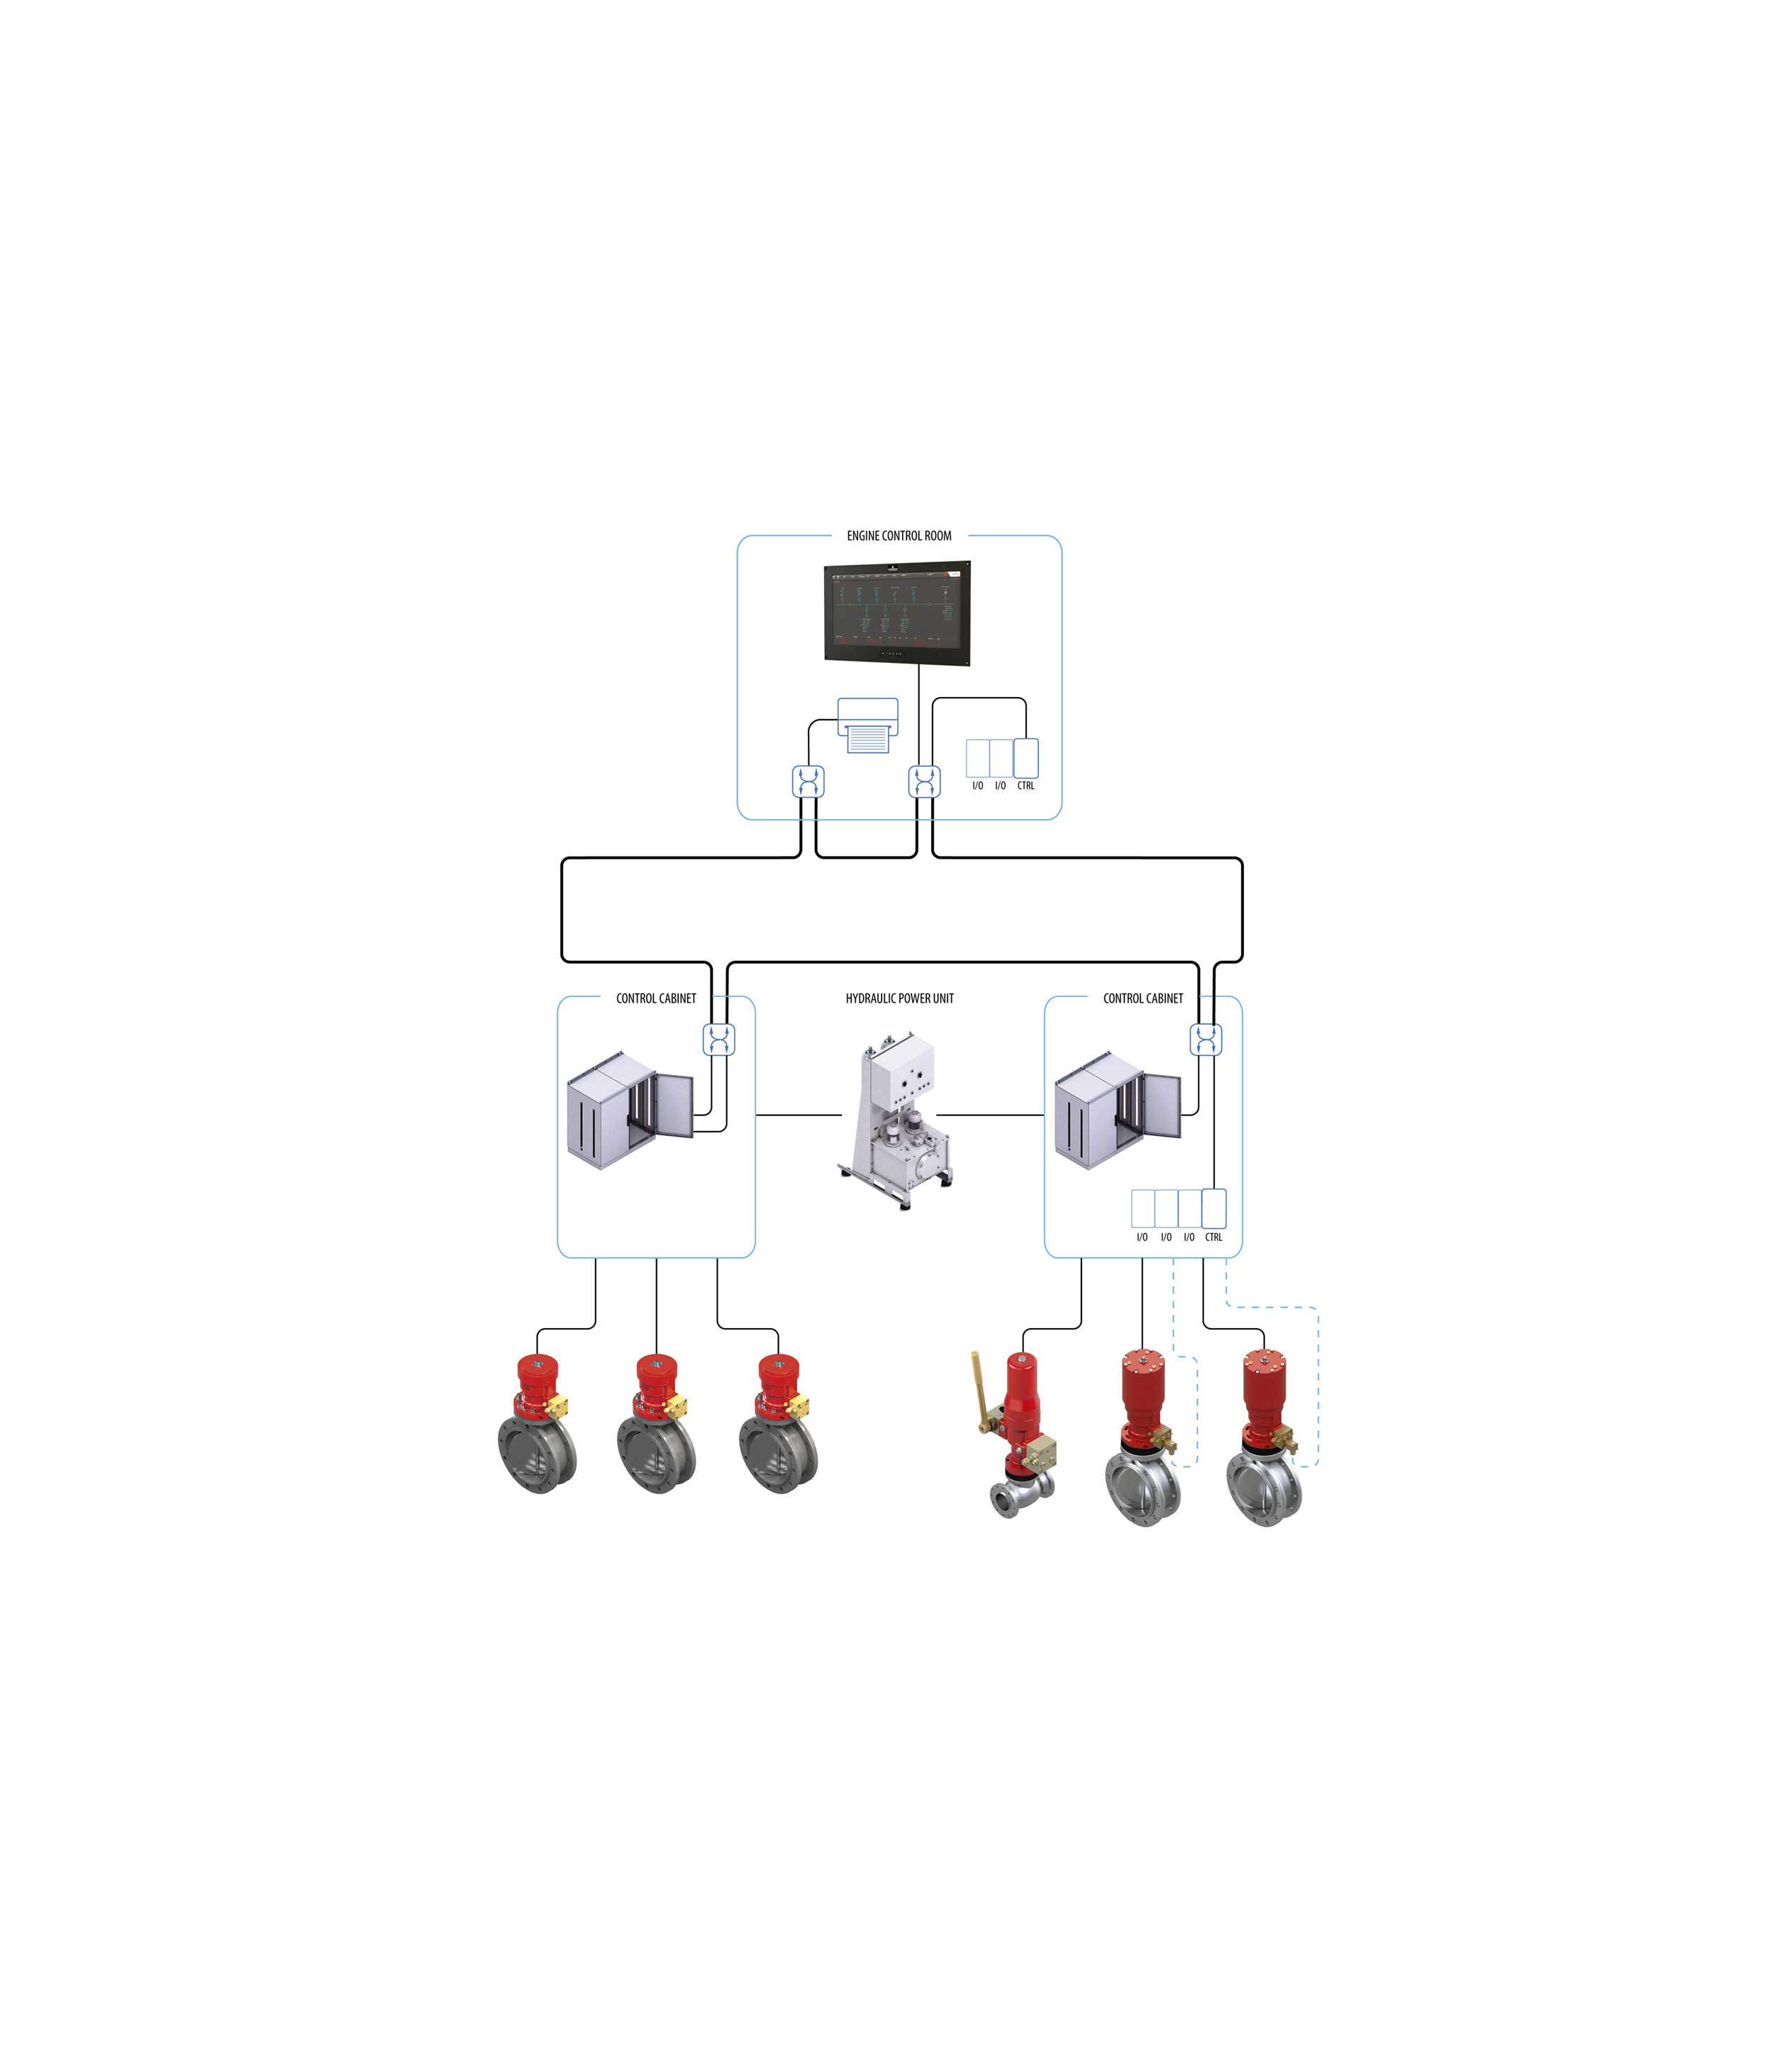 Valve Remote Control Systems | Emerson HU